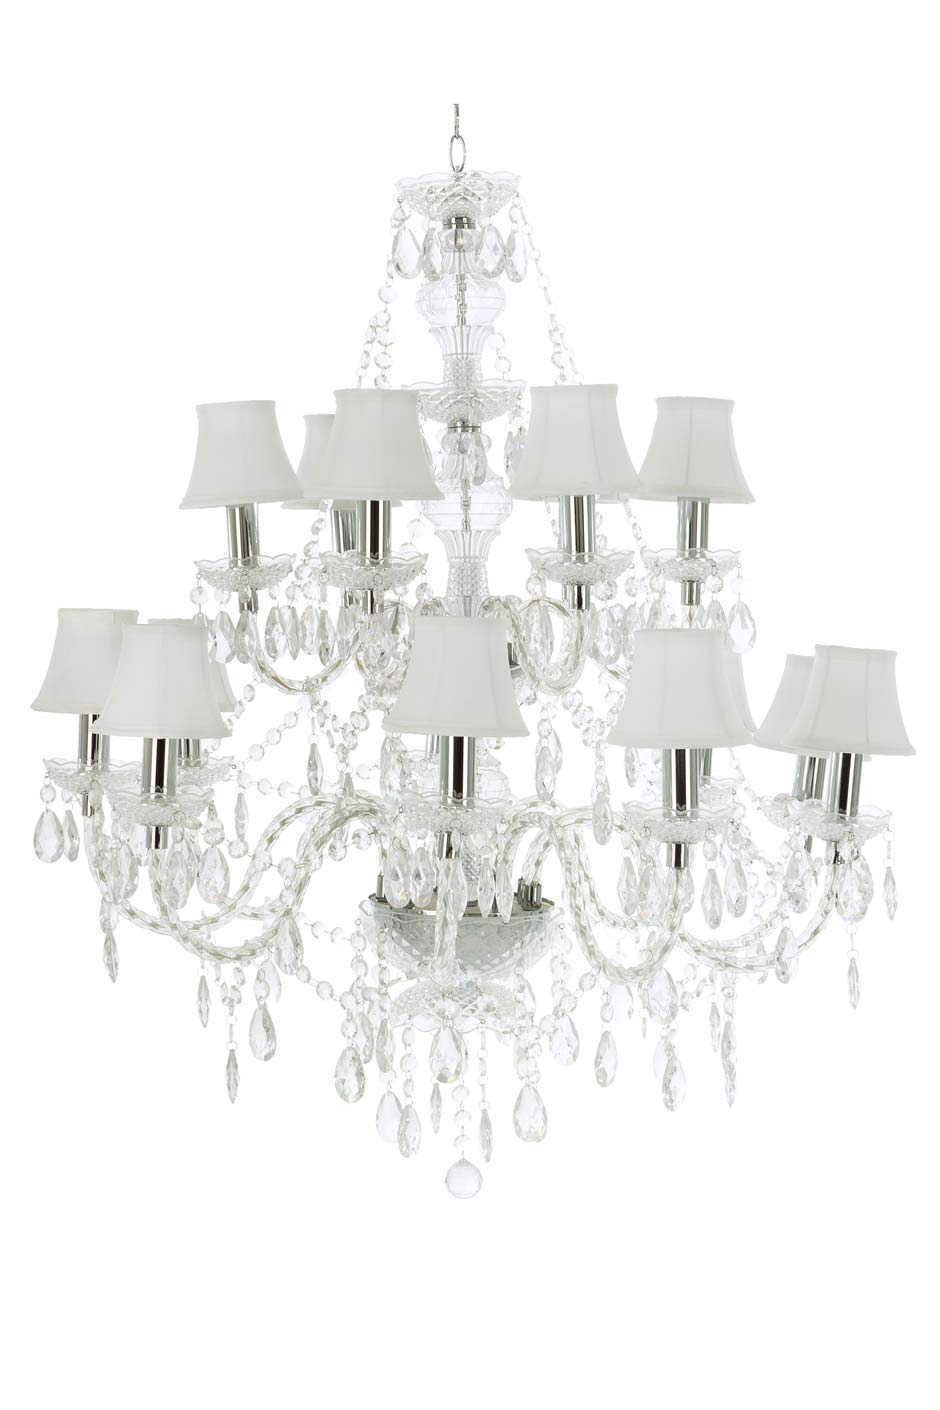 romeo lustre baroque 15 lumi res transparent abat jour. Black Bedroom Furniture Sets. Home Design Ideas